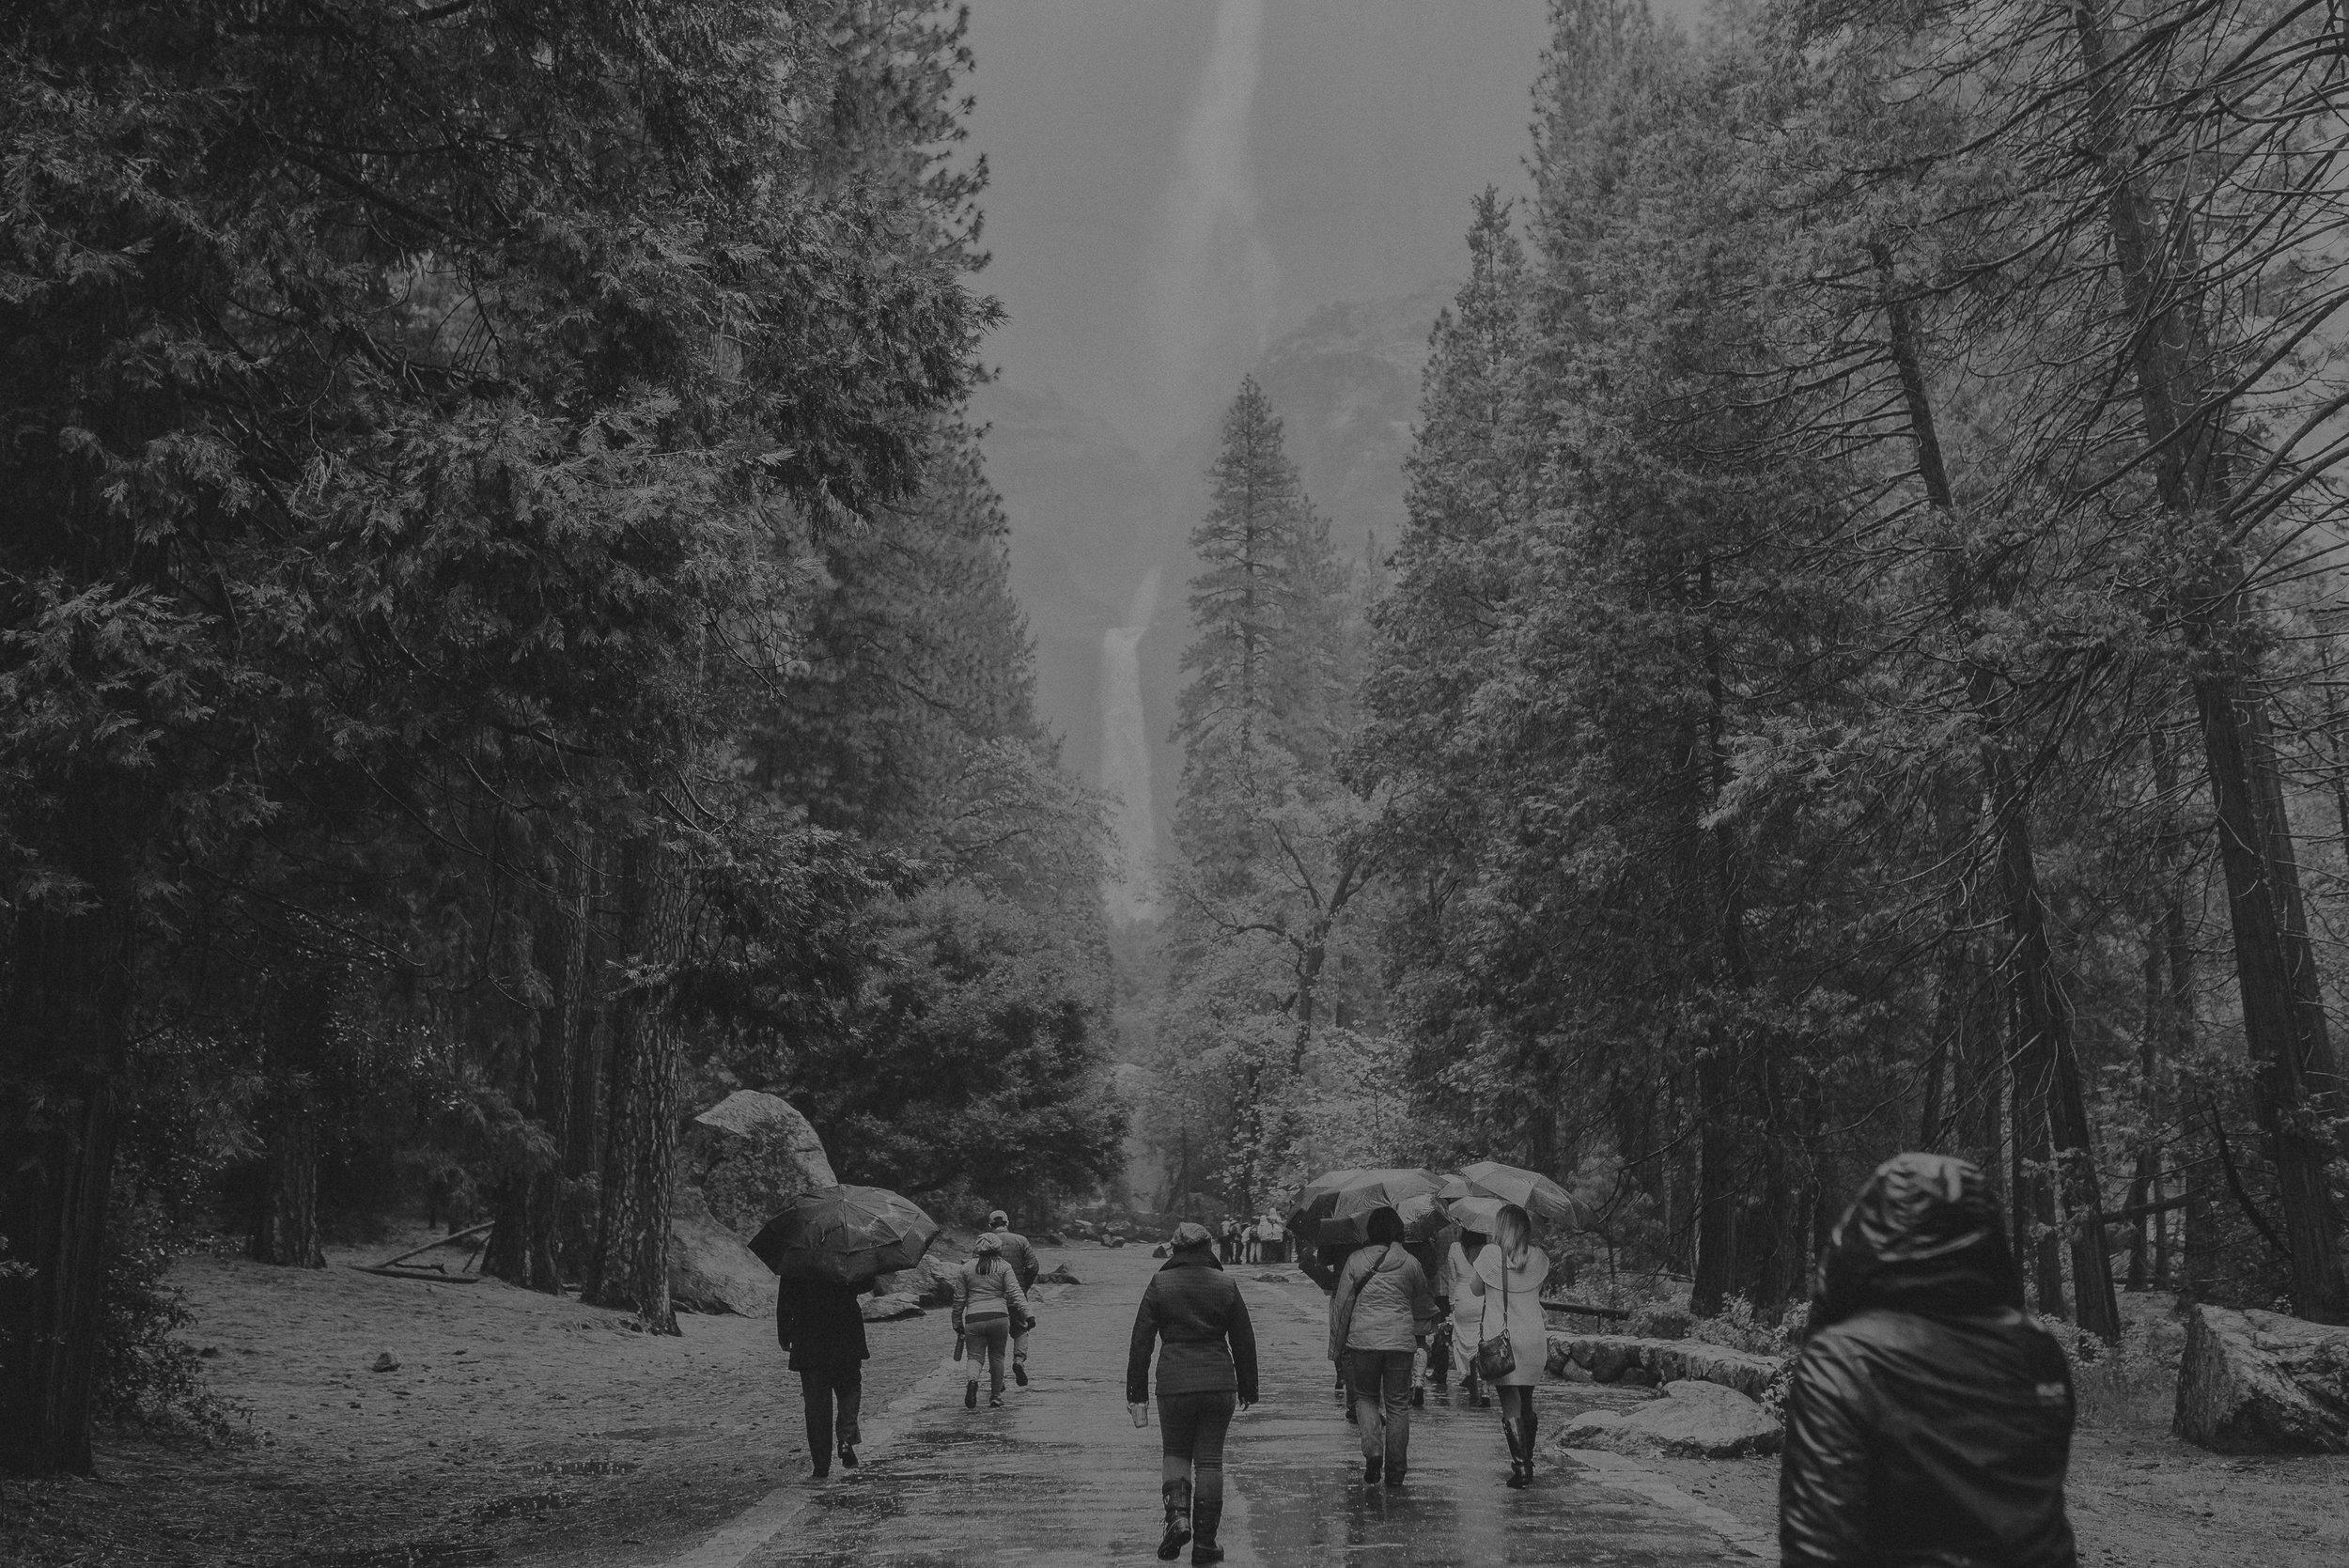 Isaiah + Taylor Photography - Yosemite Elopement - Los Angeles Wedding Photographer-25.jpg